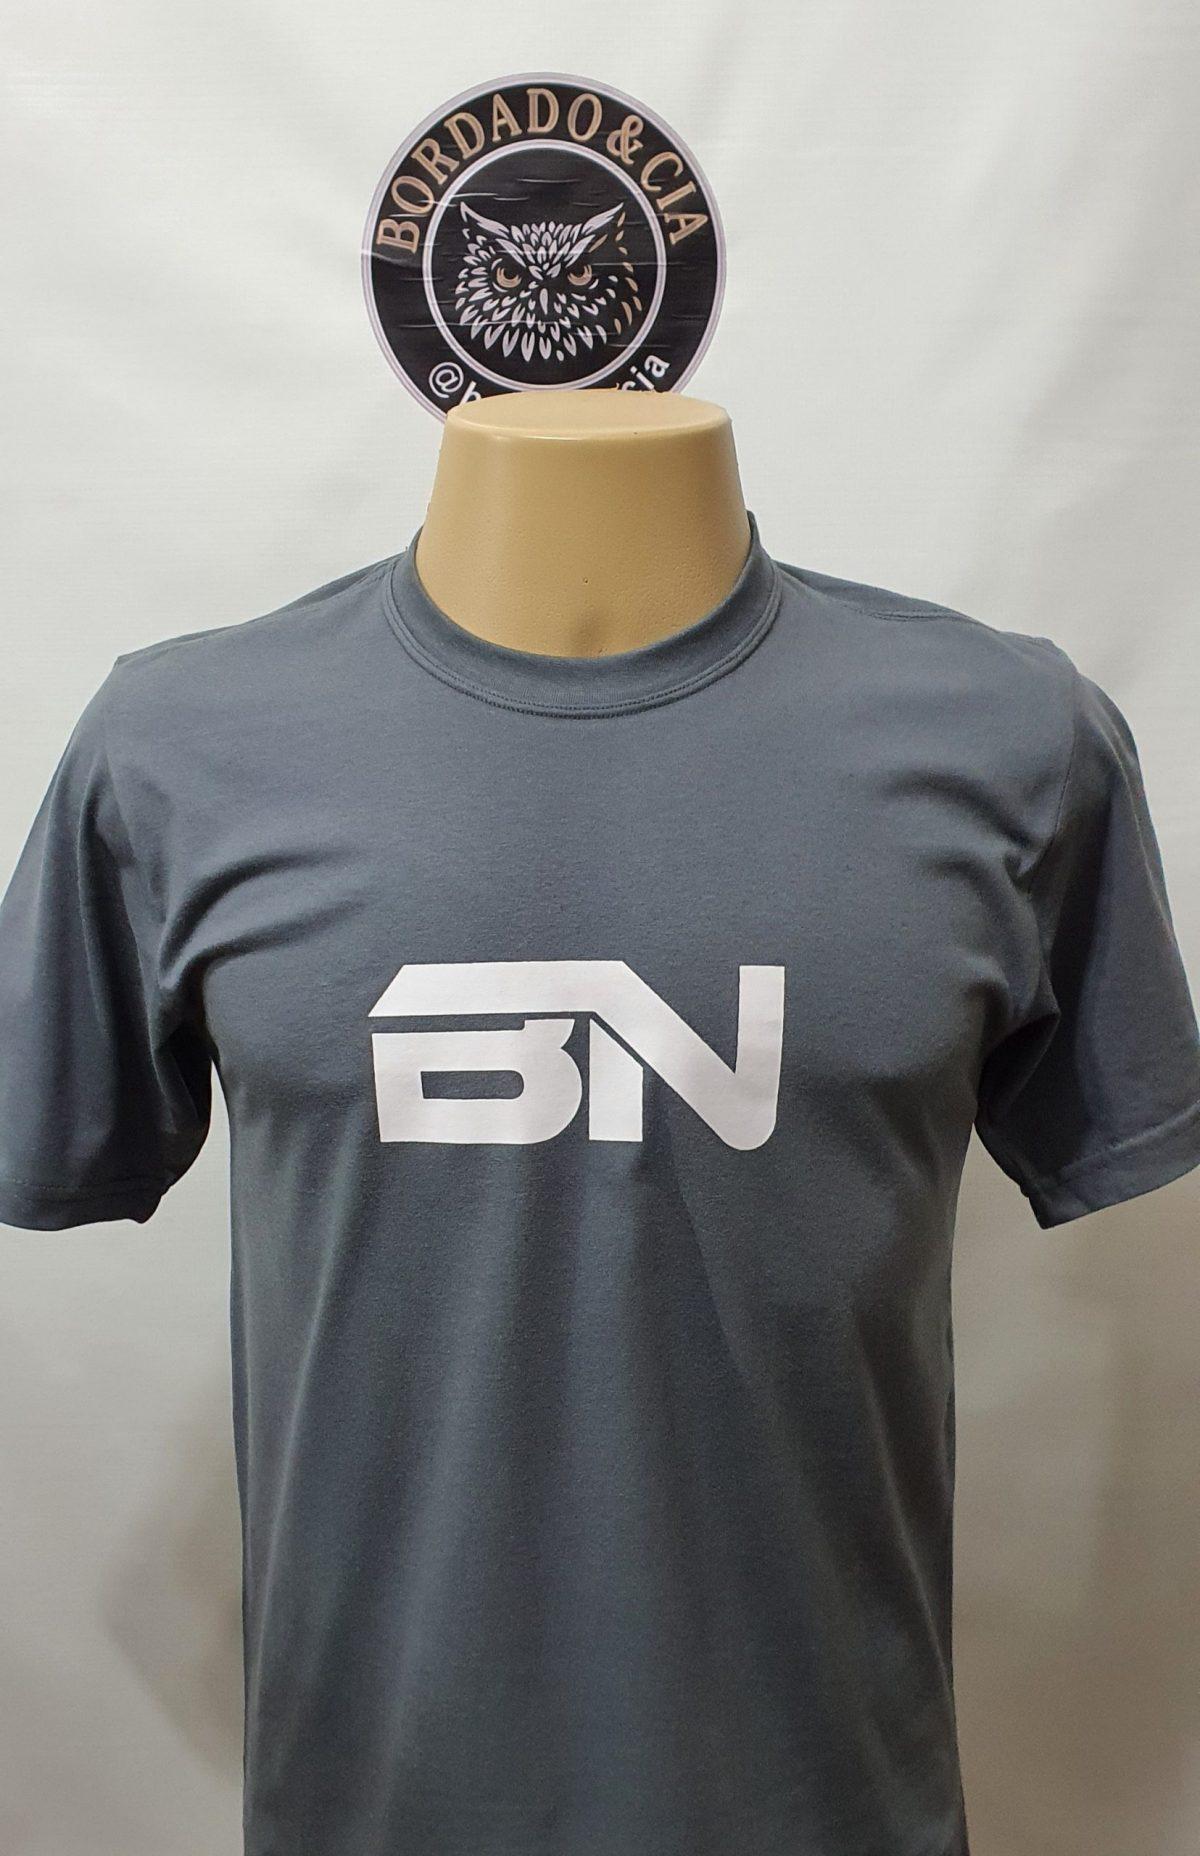 Camiseta Oficial Beto Nini DJ by Bordado & Cia - @betonini